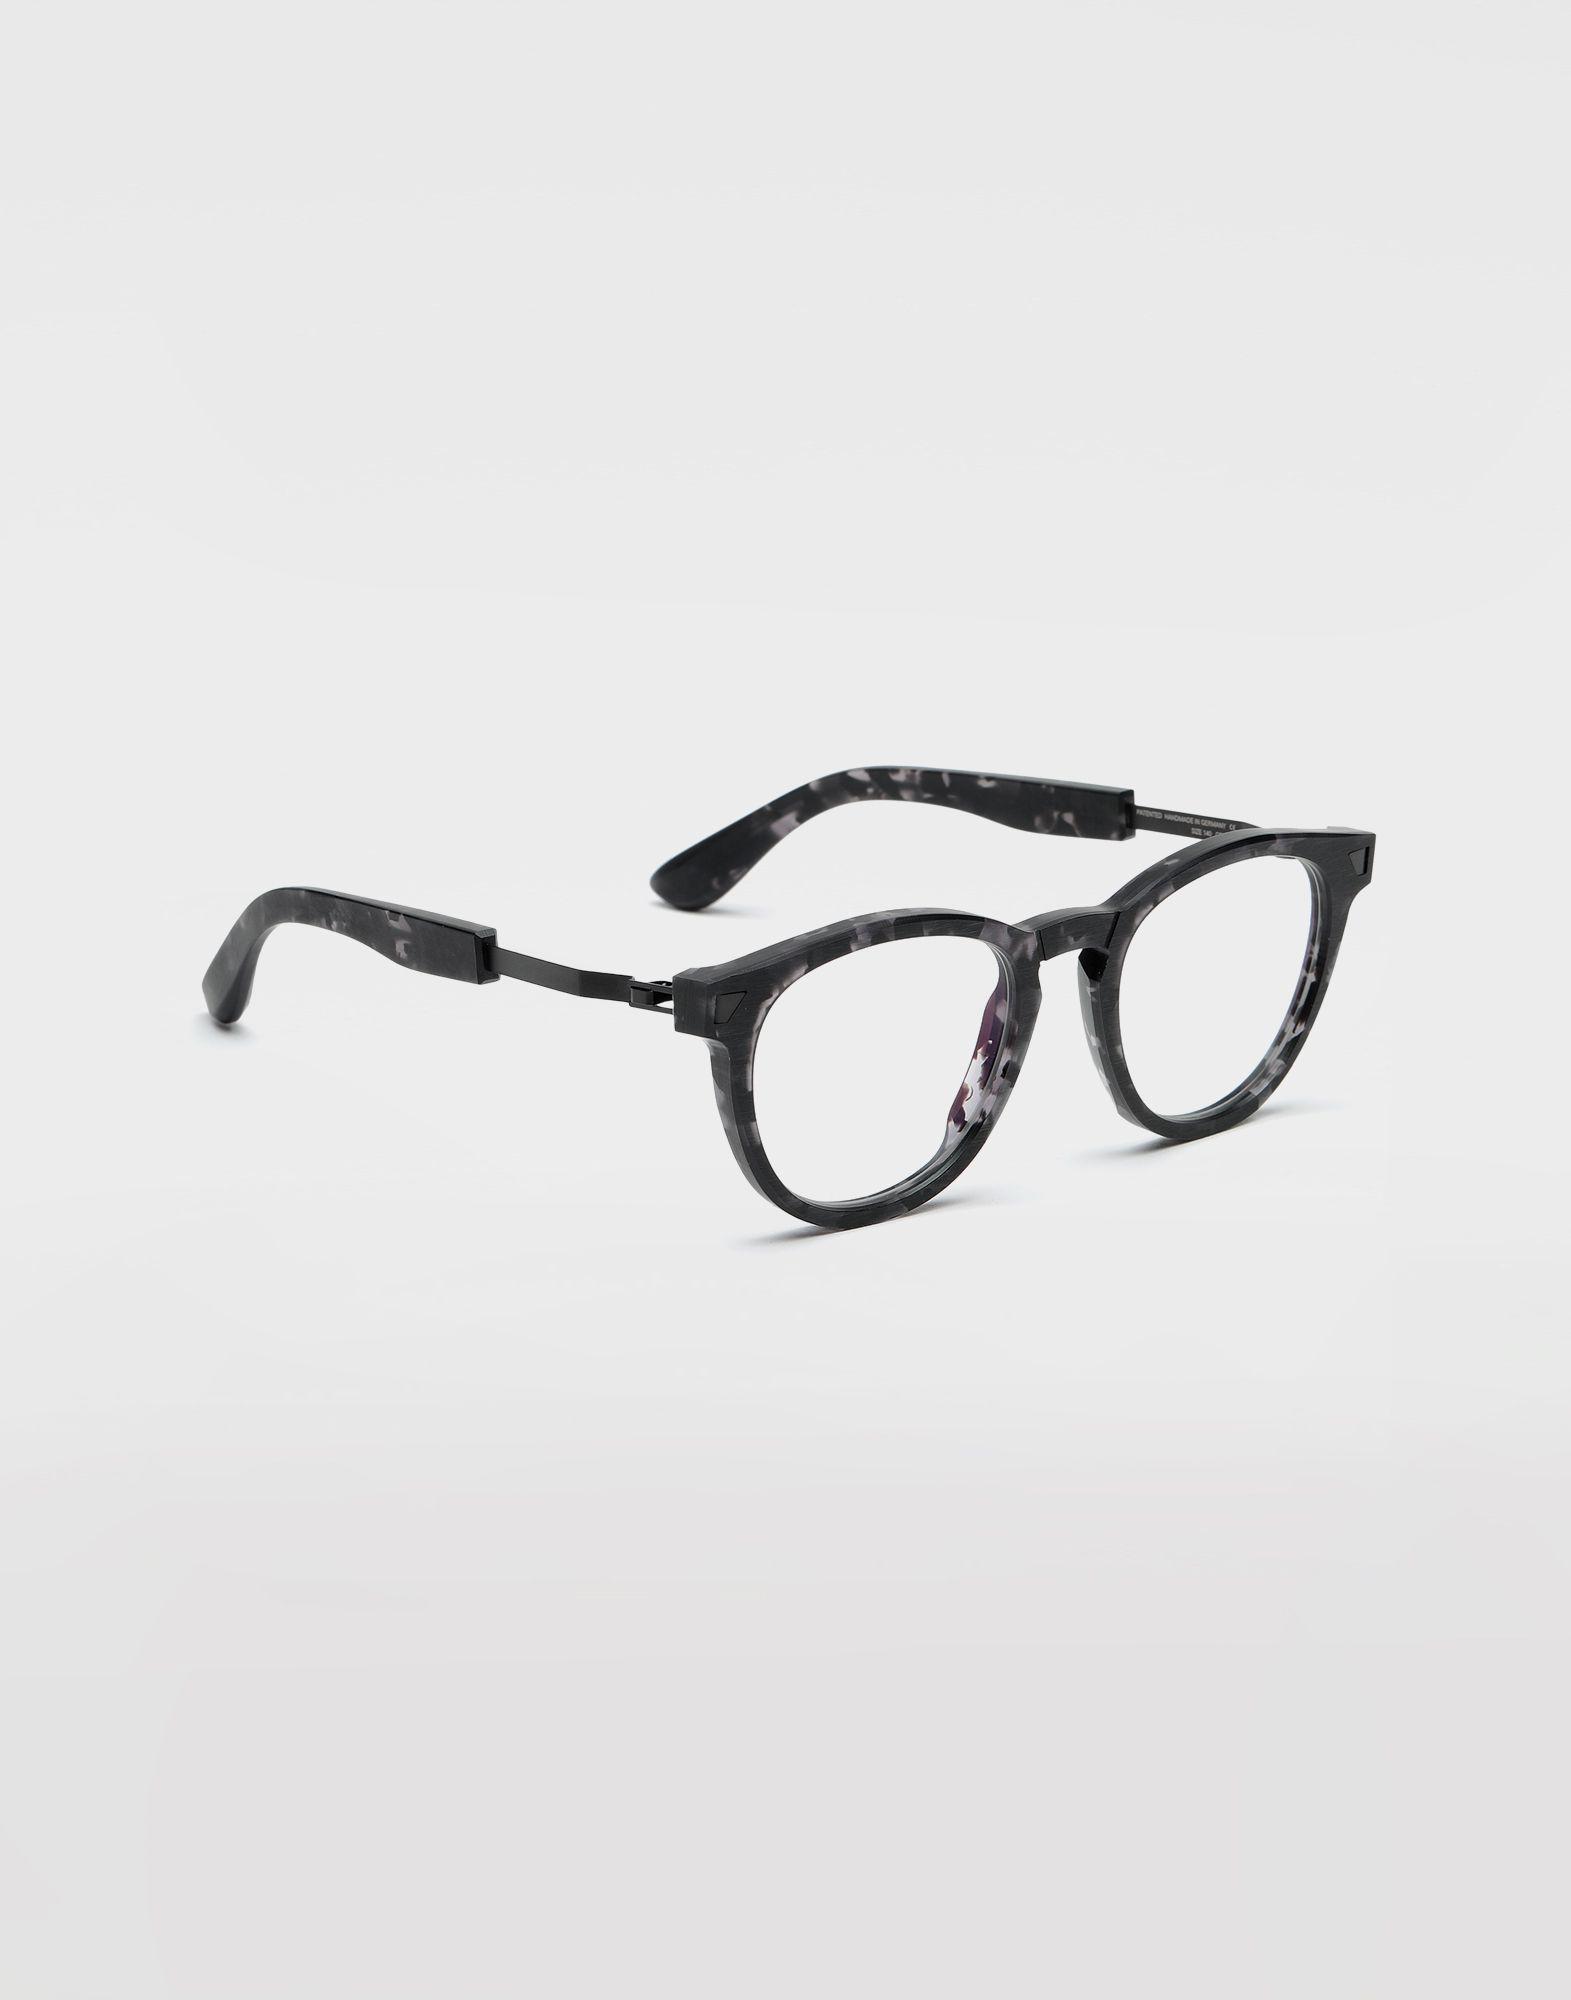 MAISON MARGIELA MYKITA + MAISON MARGIELA 'RAW' Eyewear E r